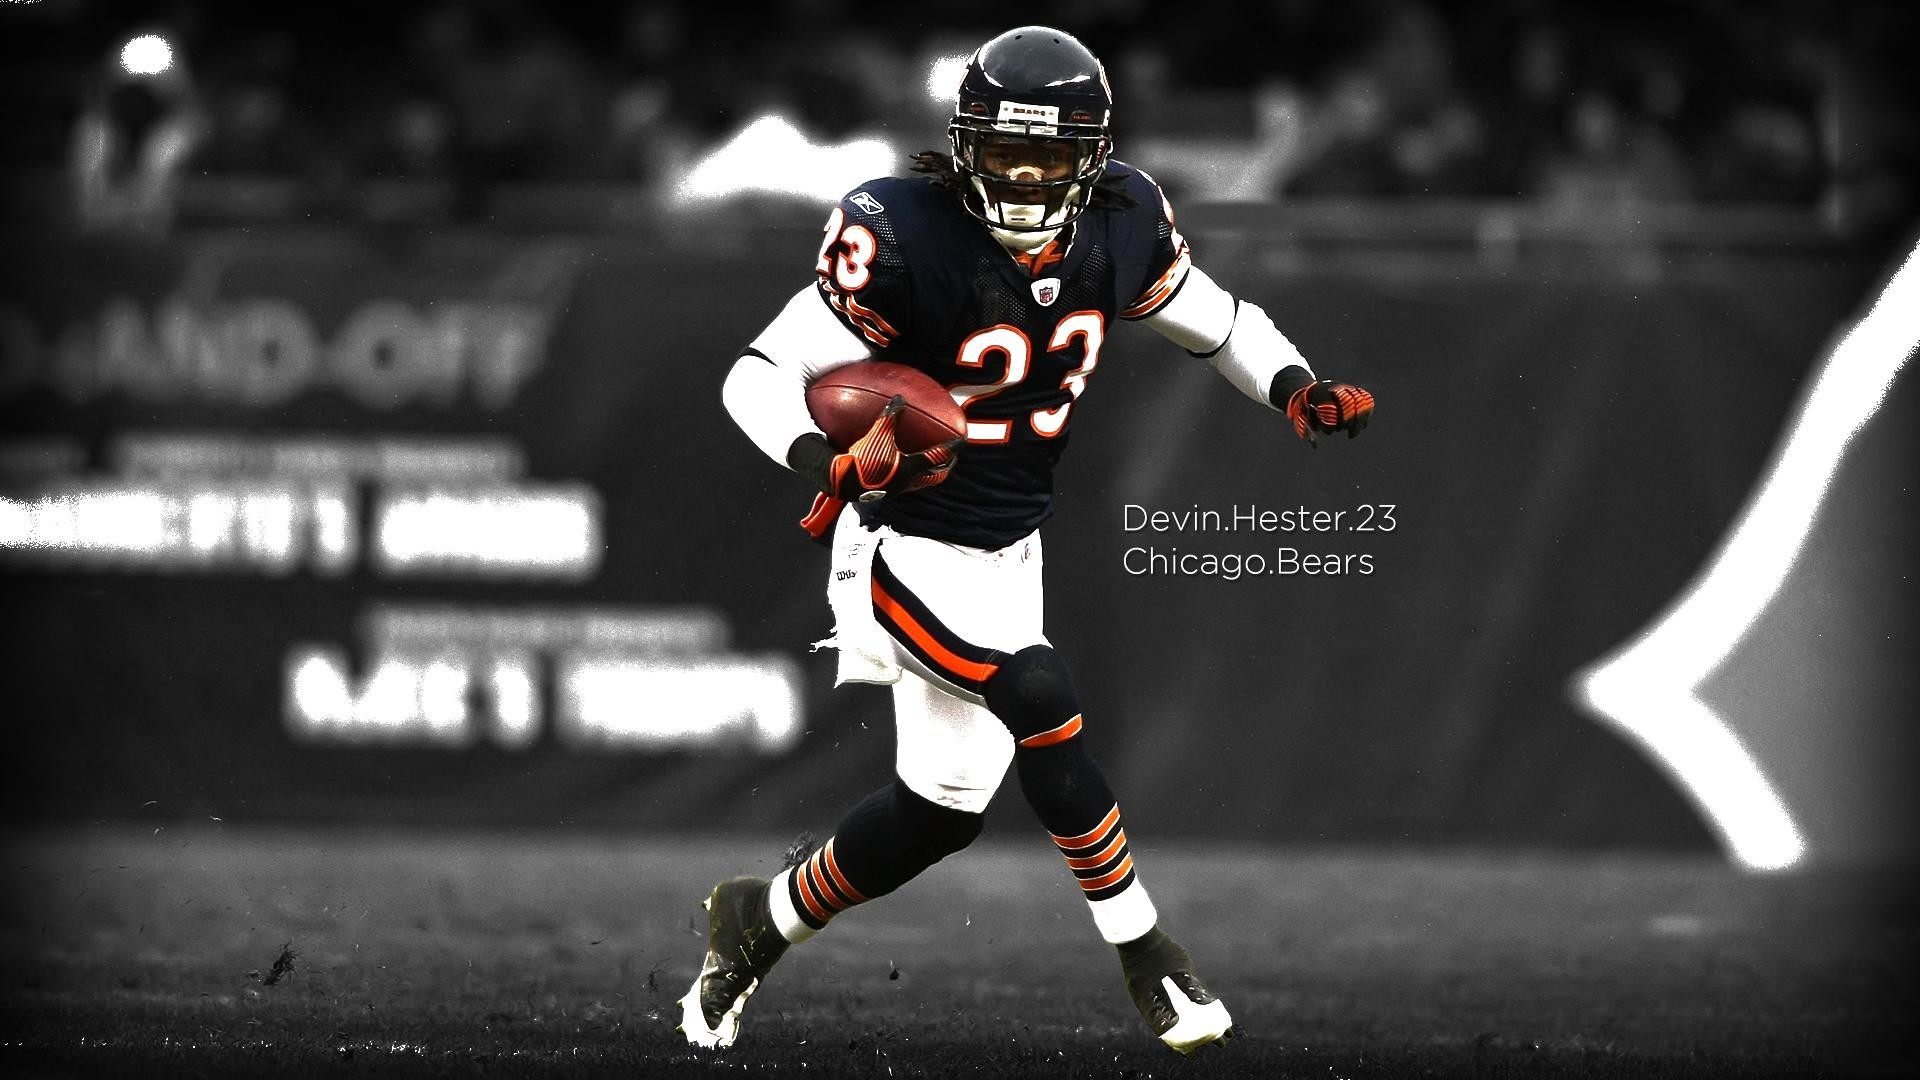 Cool American Football Bears Devin Wallpaper F #9694 Wallpaper .